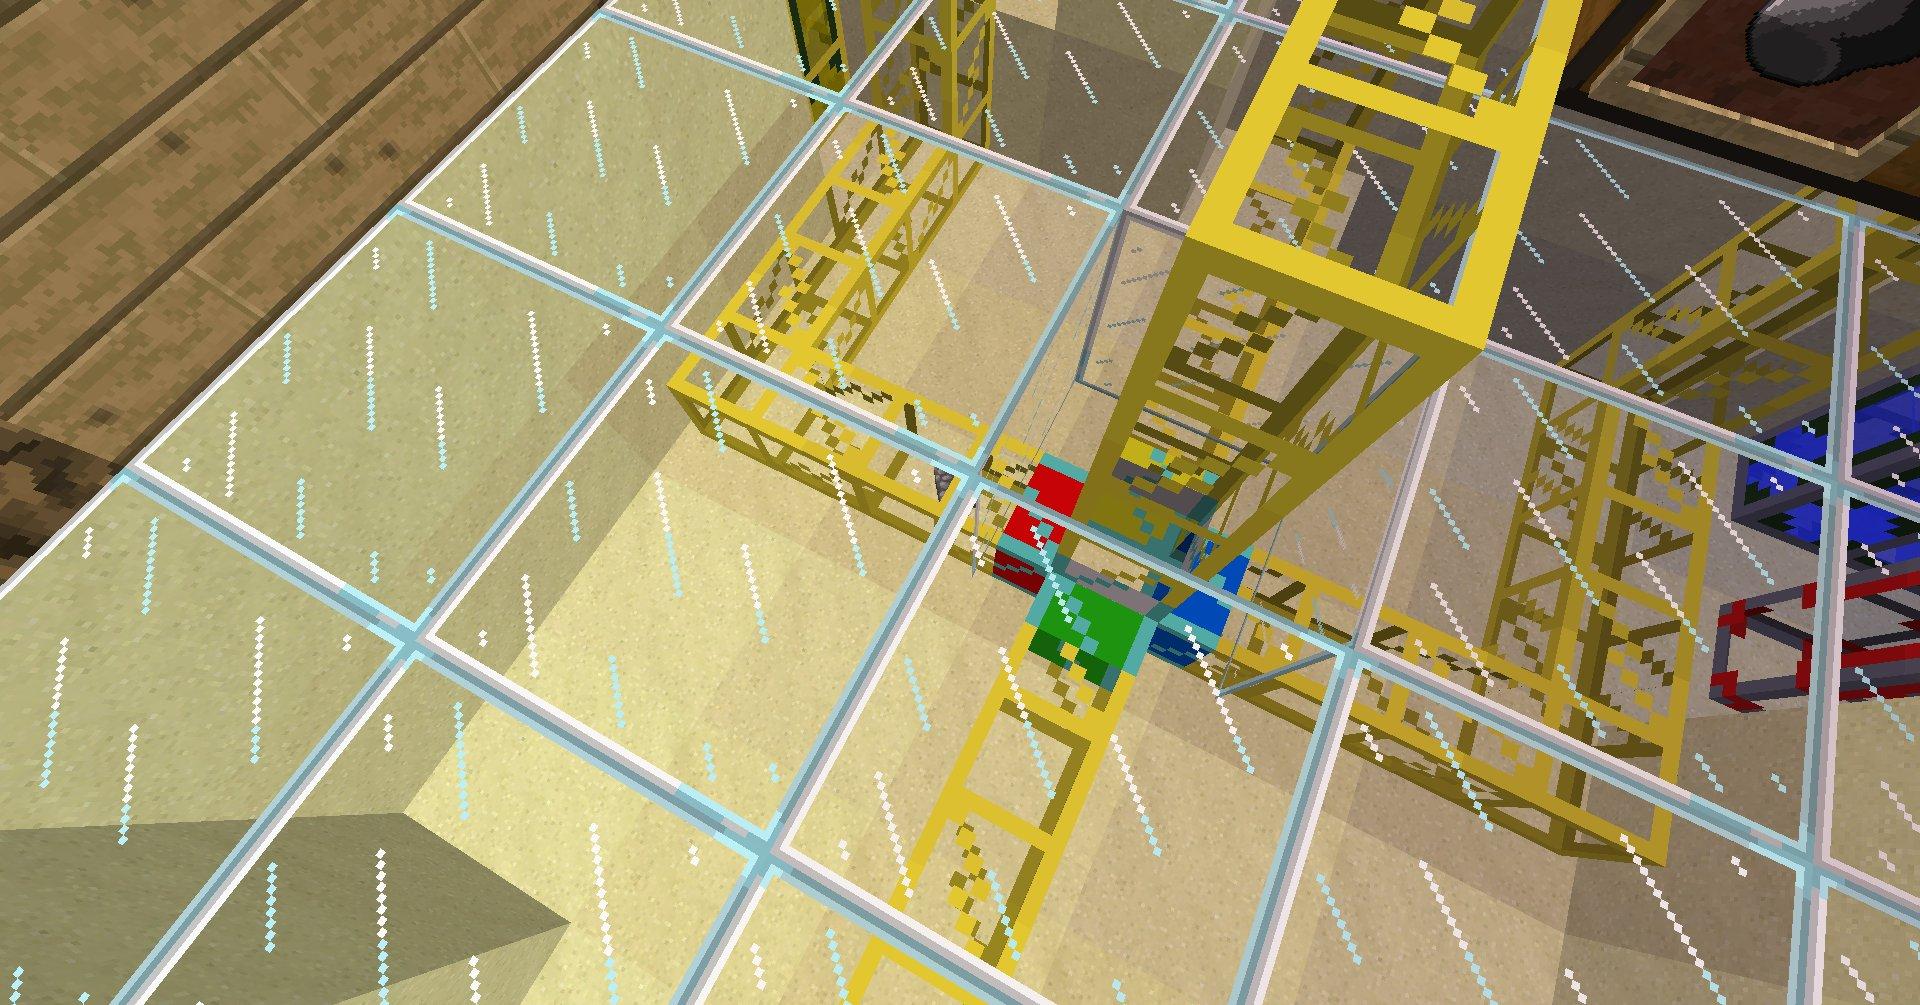 poradnik buildcraft 3 12